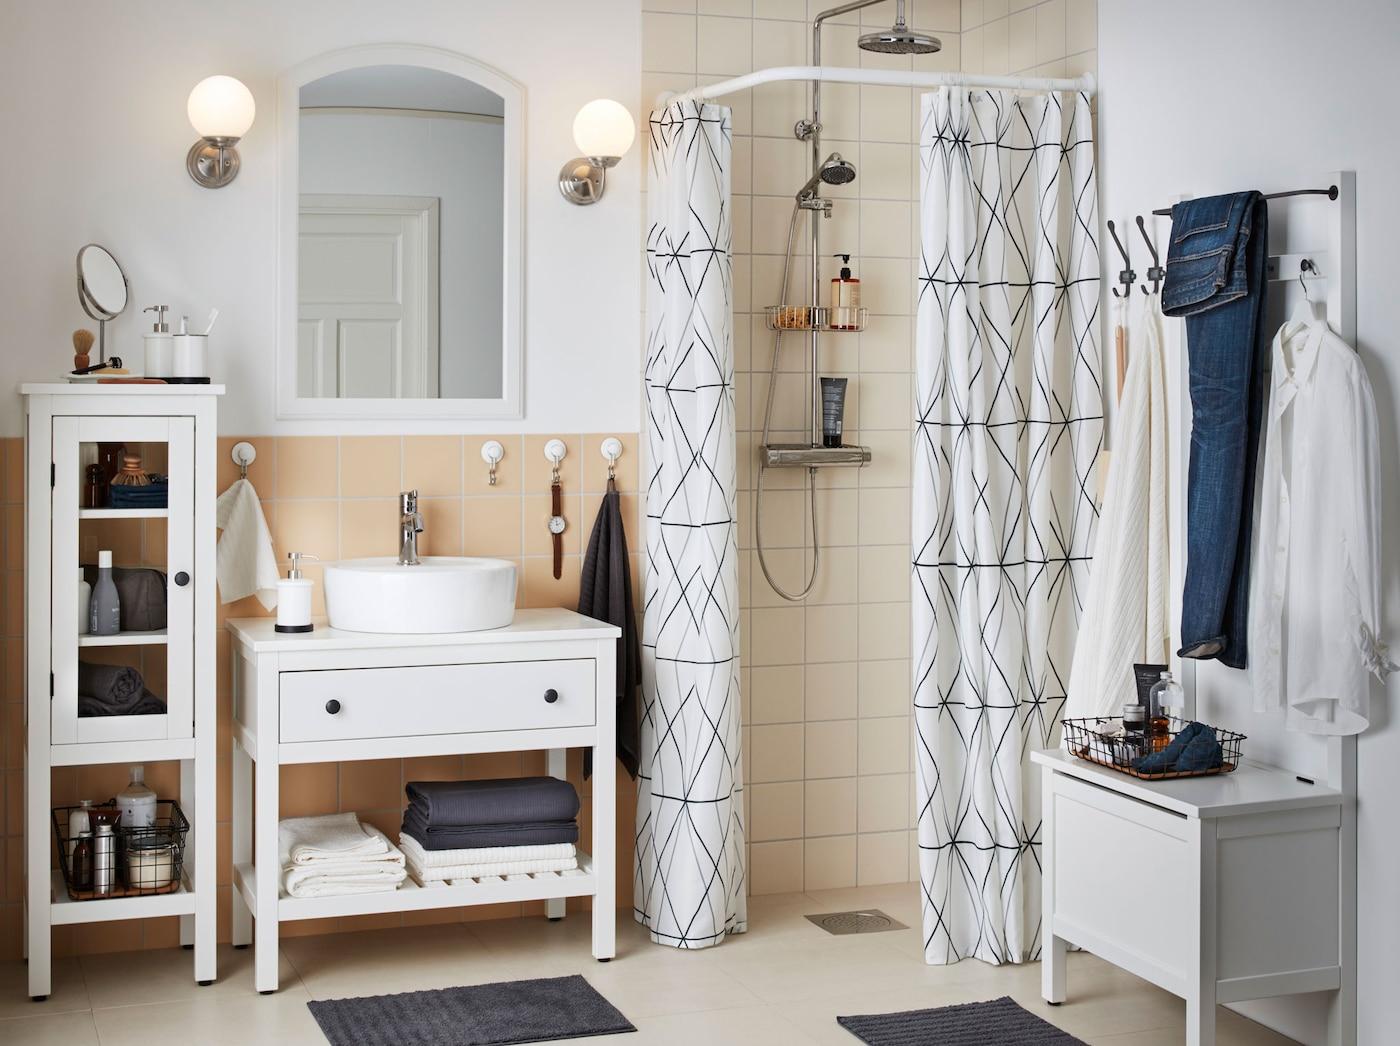 Storage Ikea Freeclosed 0kx8nowp Clutter A Bathroom Flc1TJK